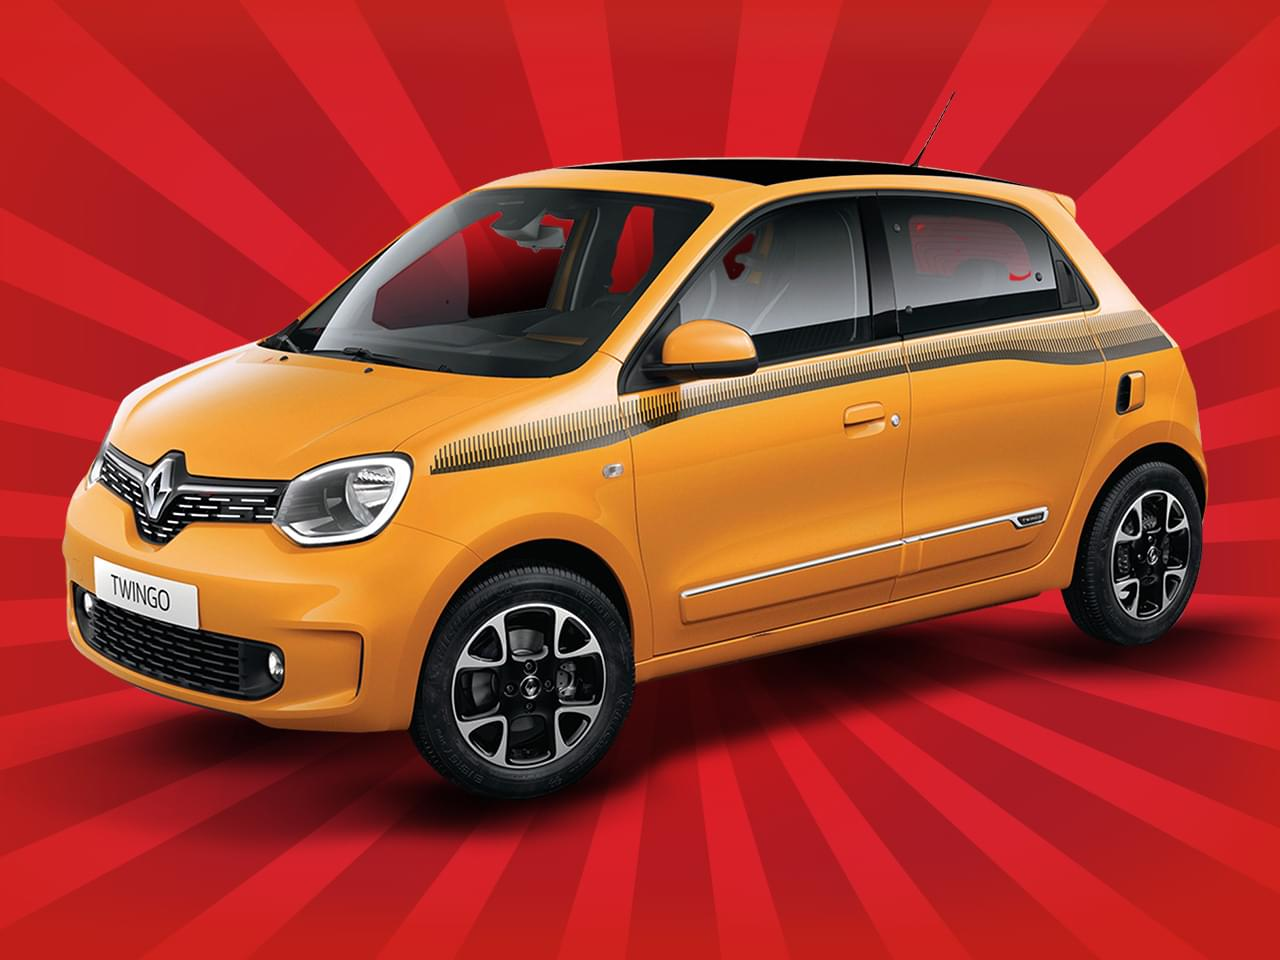 Renault Twingo Flexxleasing Limited SCe 75 Start&Stopp